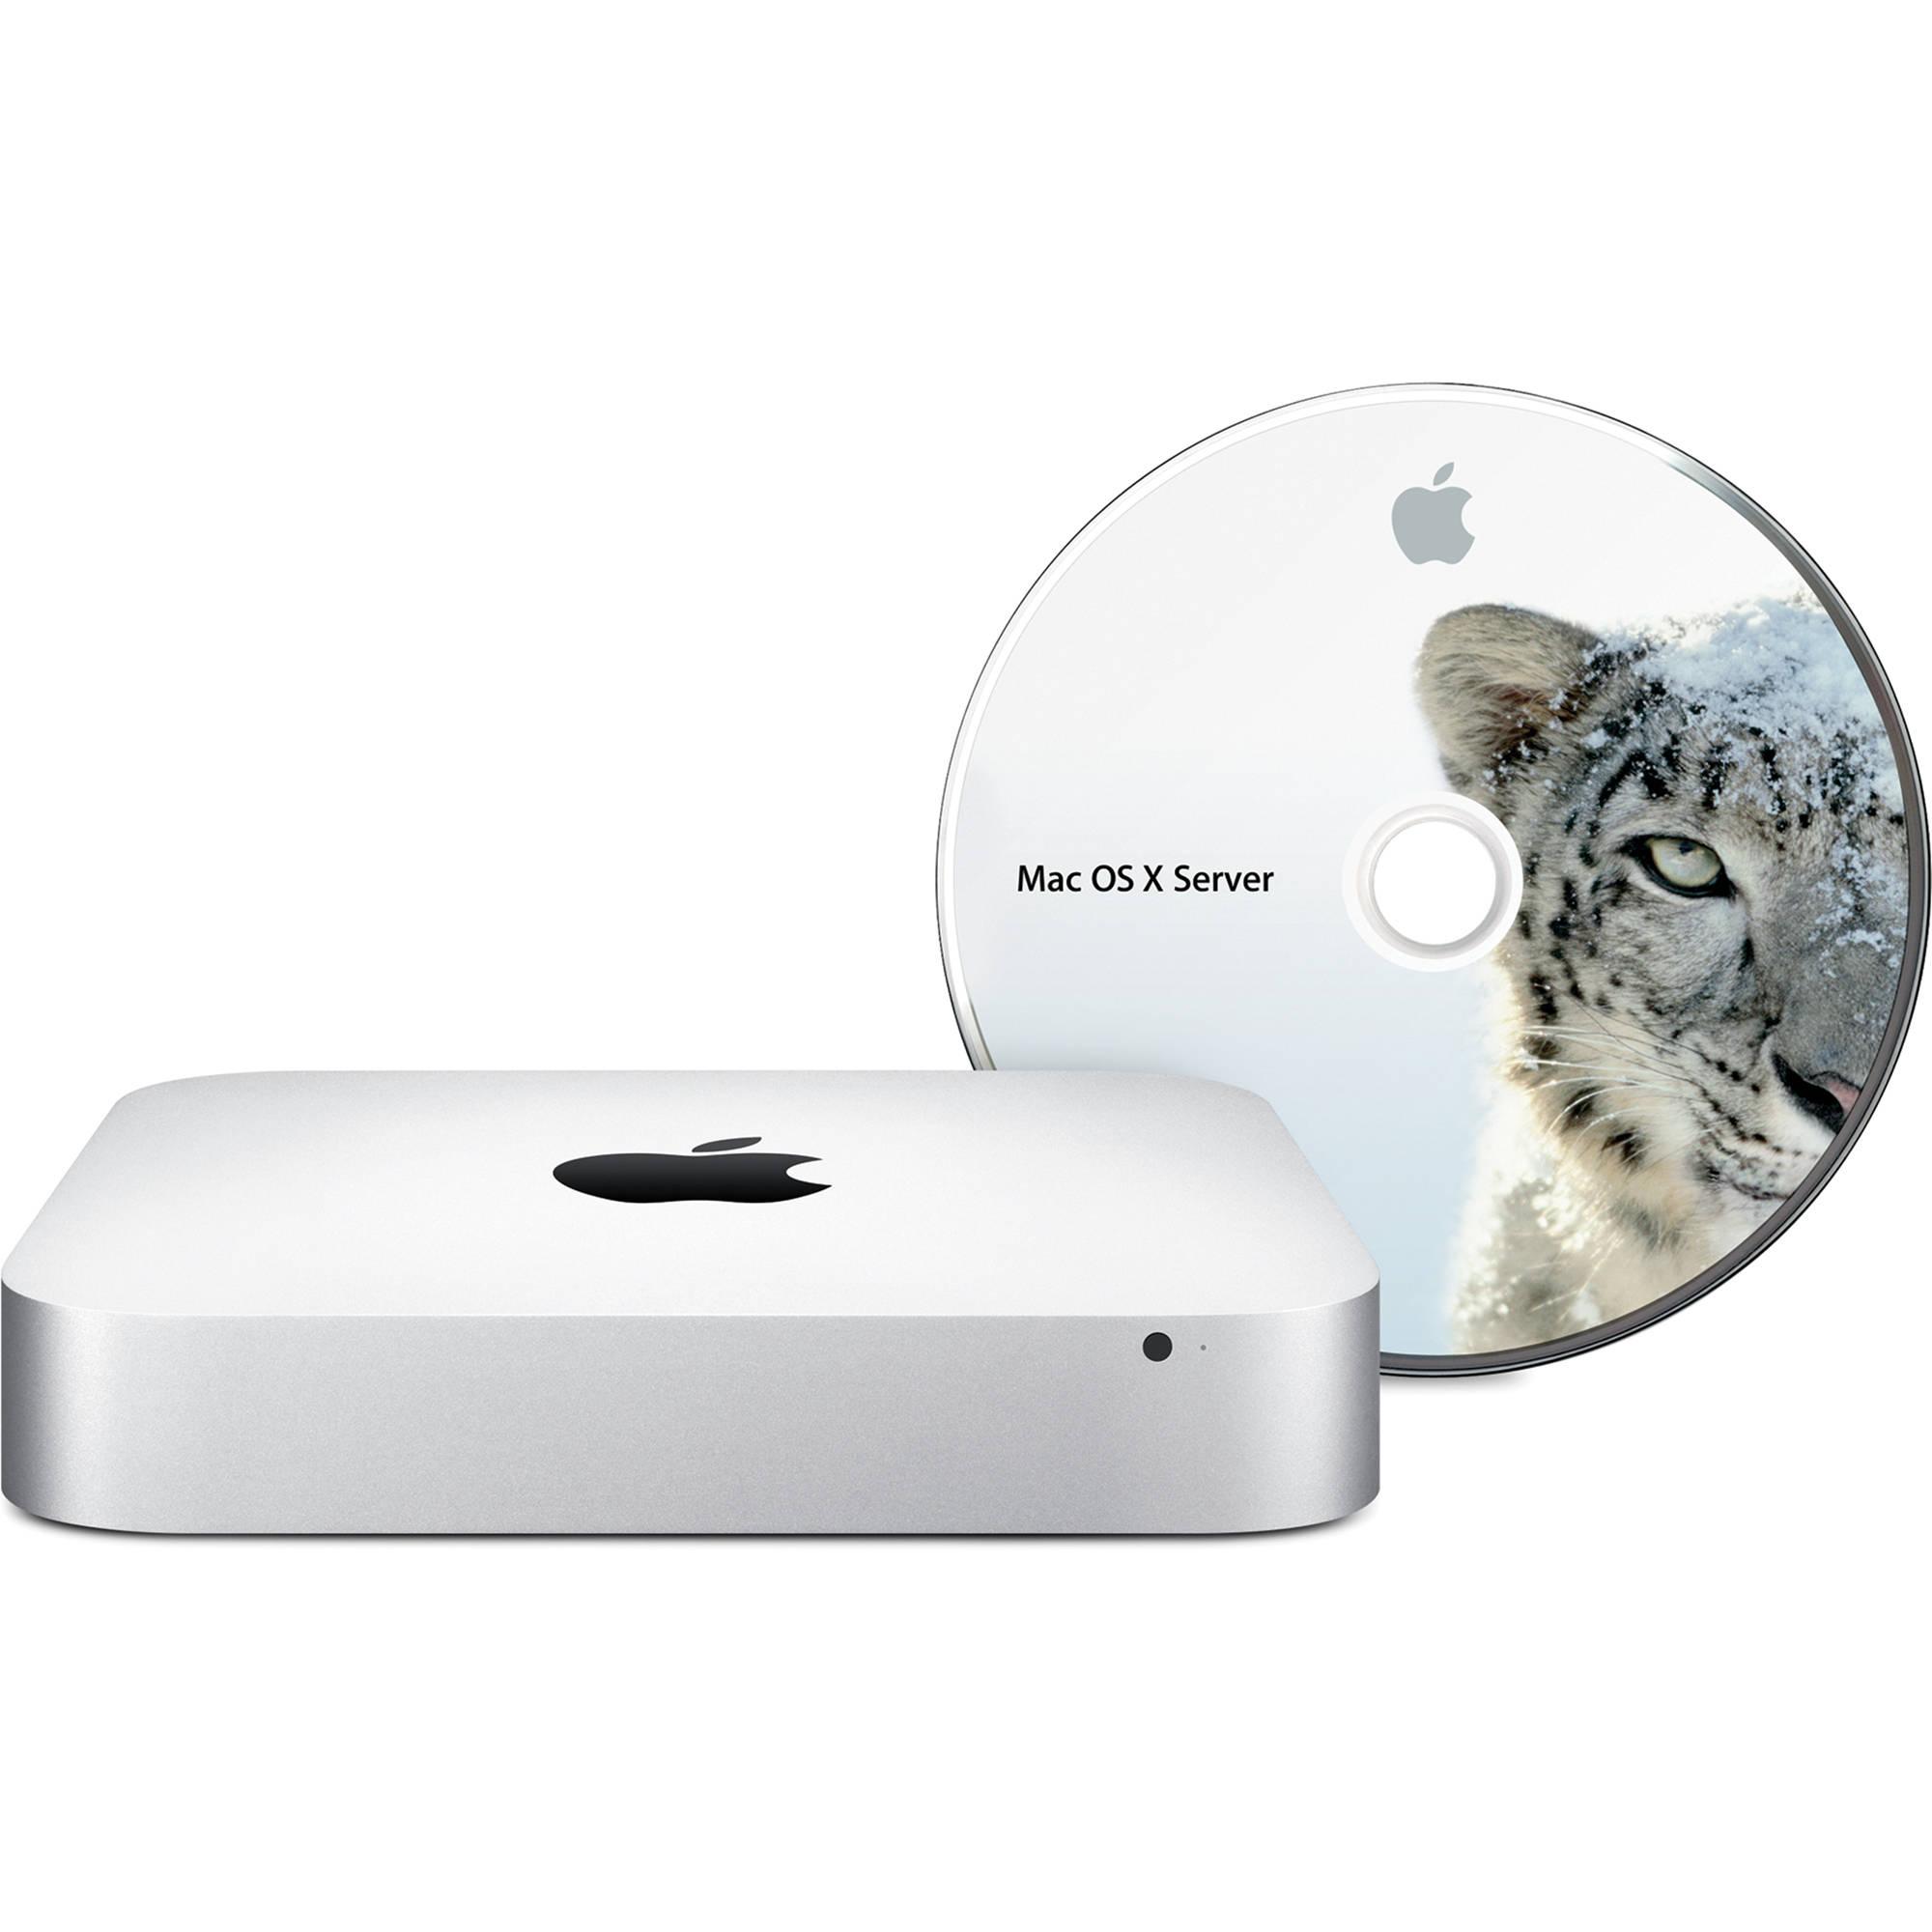 Mac Mini Server QuadCore - Use as a Desktop?